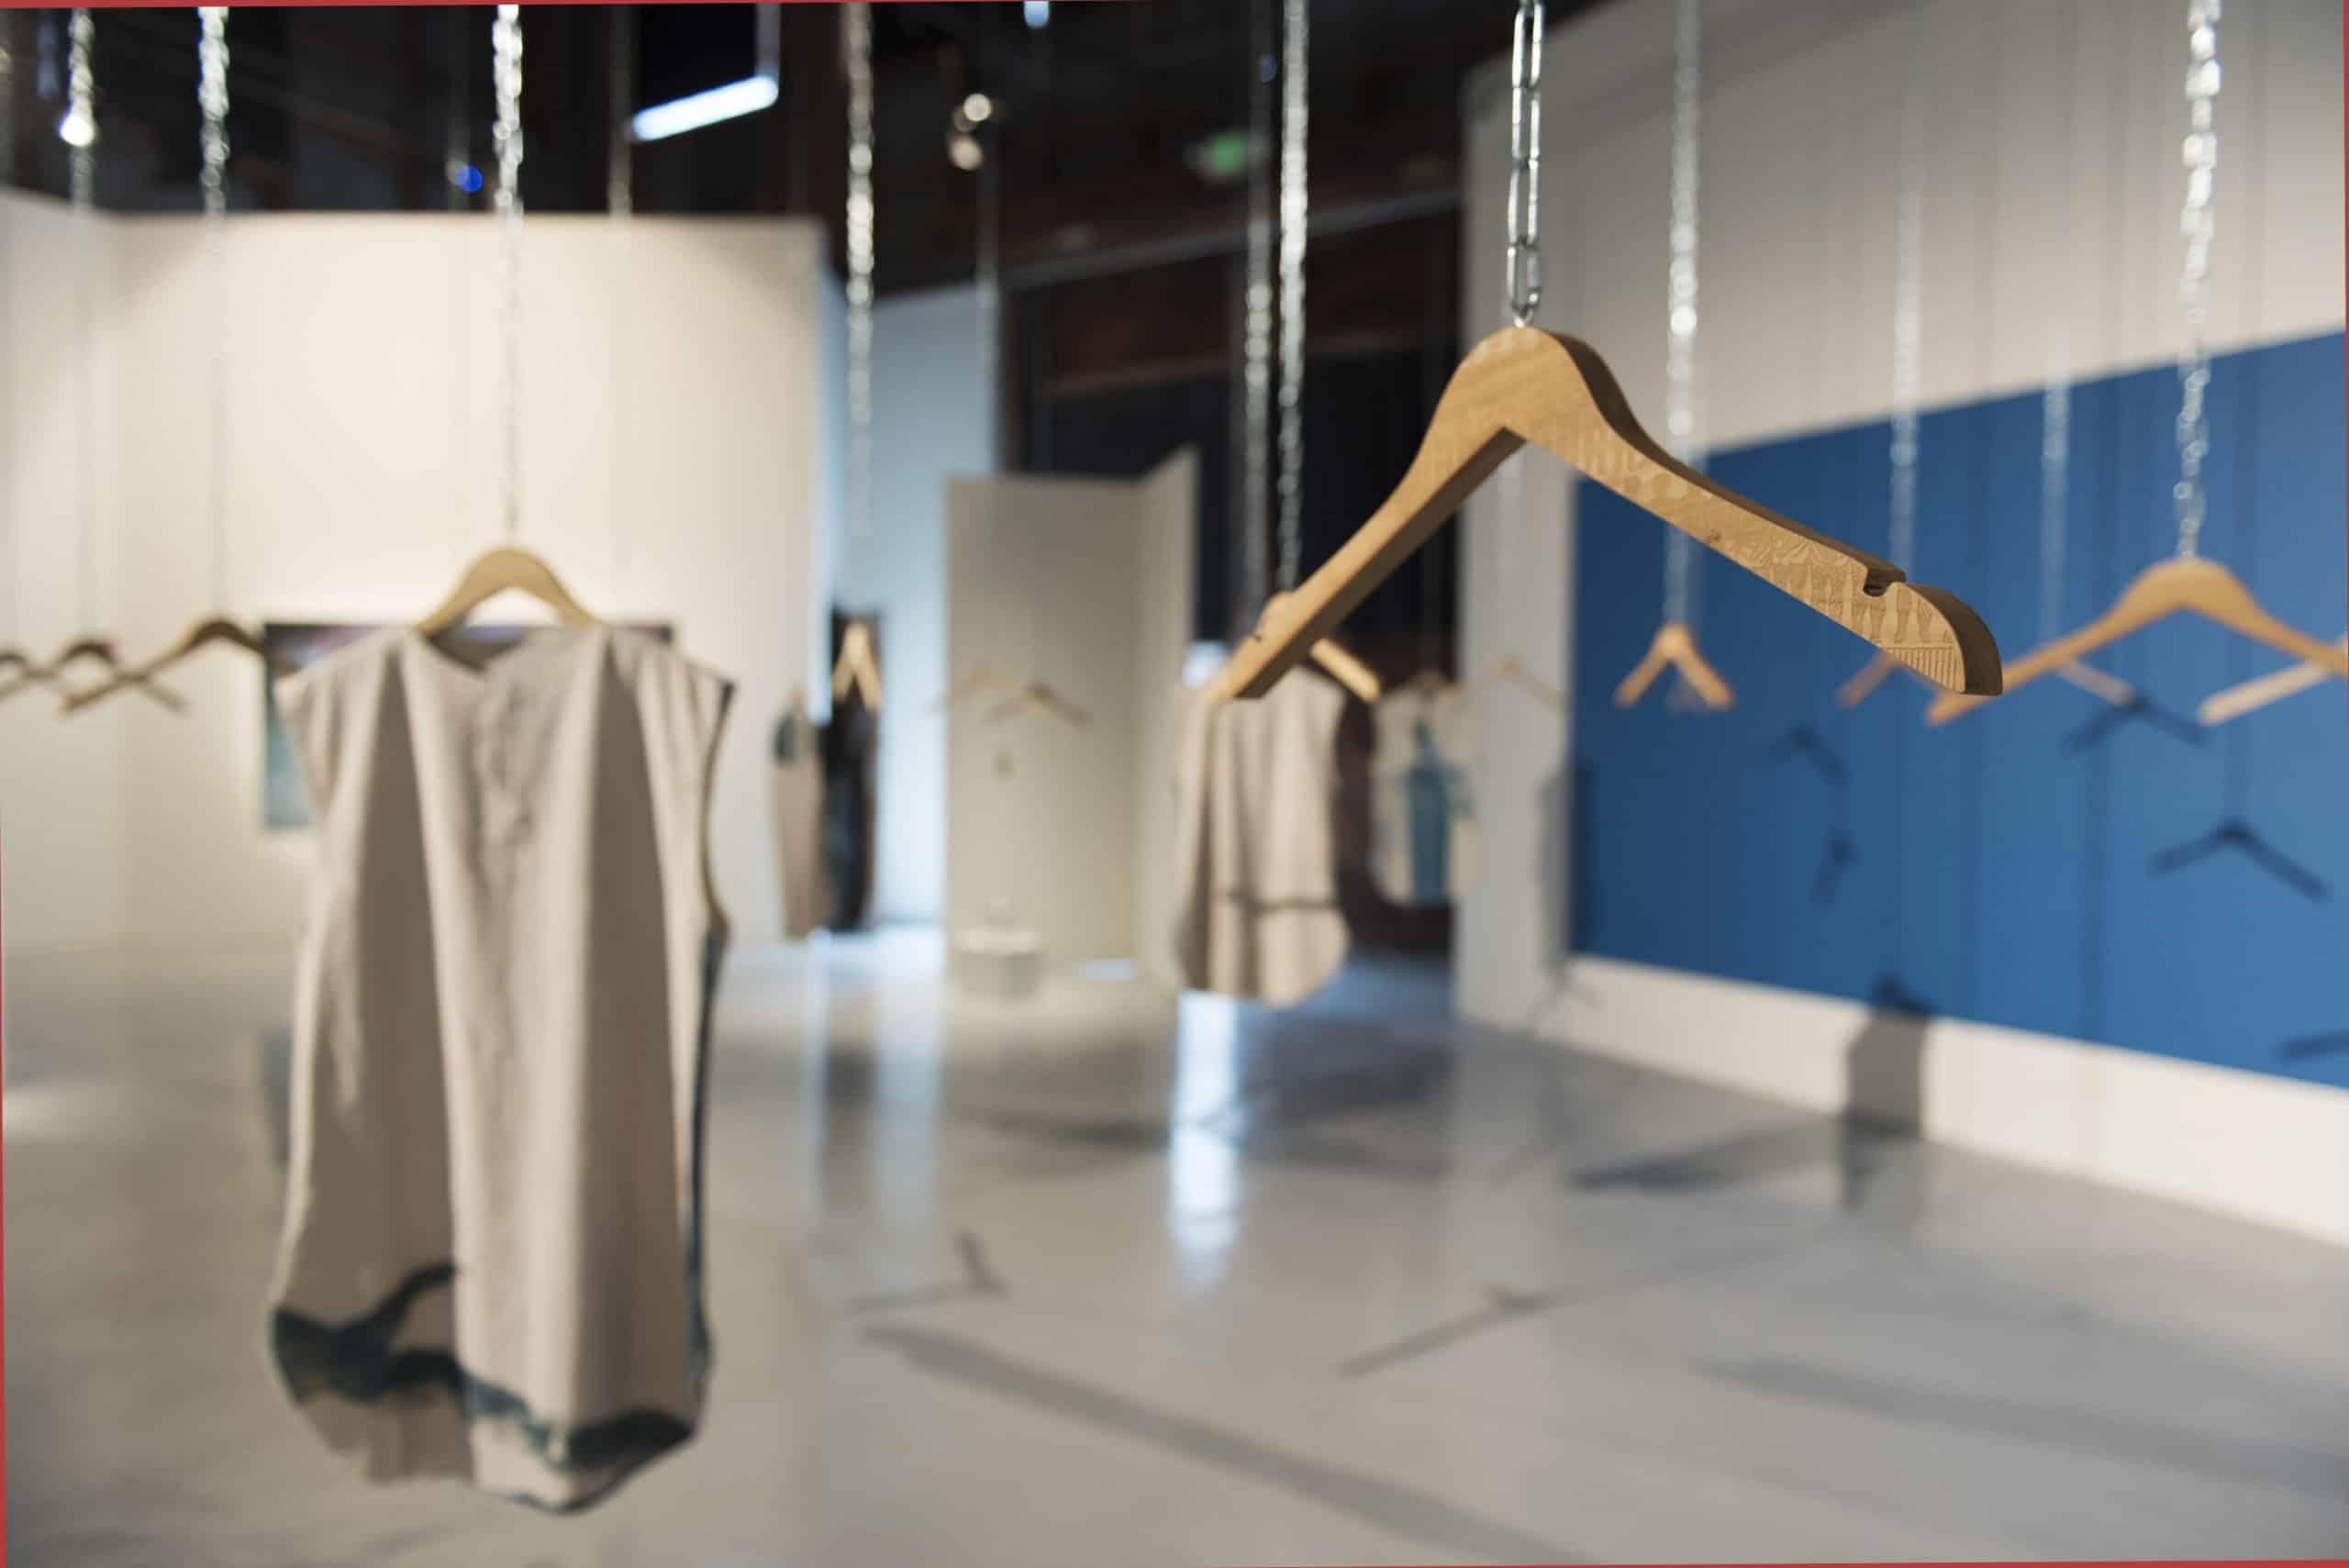 The Annual Murphy and Cadon Contemporary Art Awards Exhibition